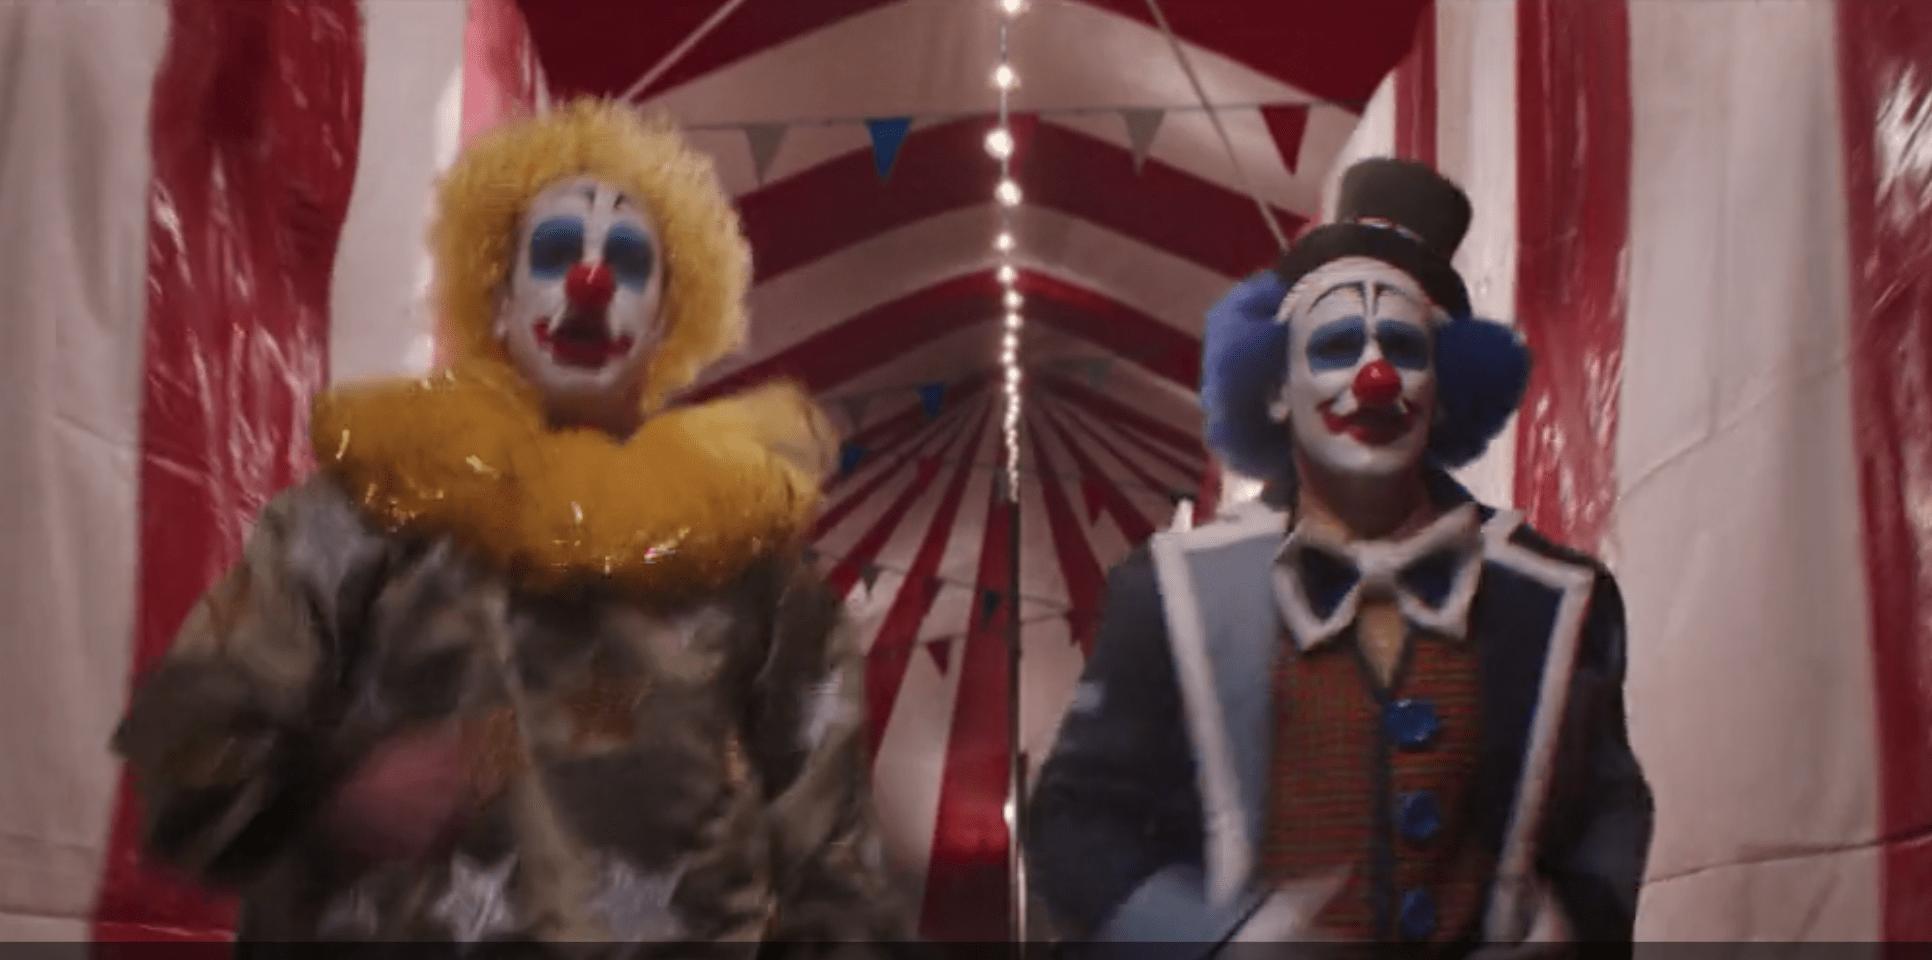 wandavision episode 6 sword clowns